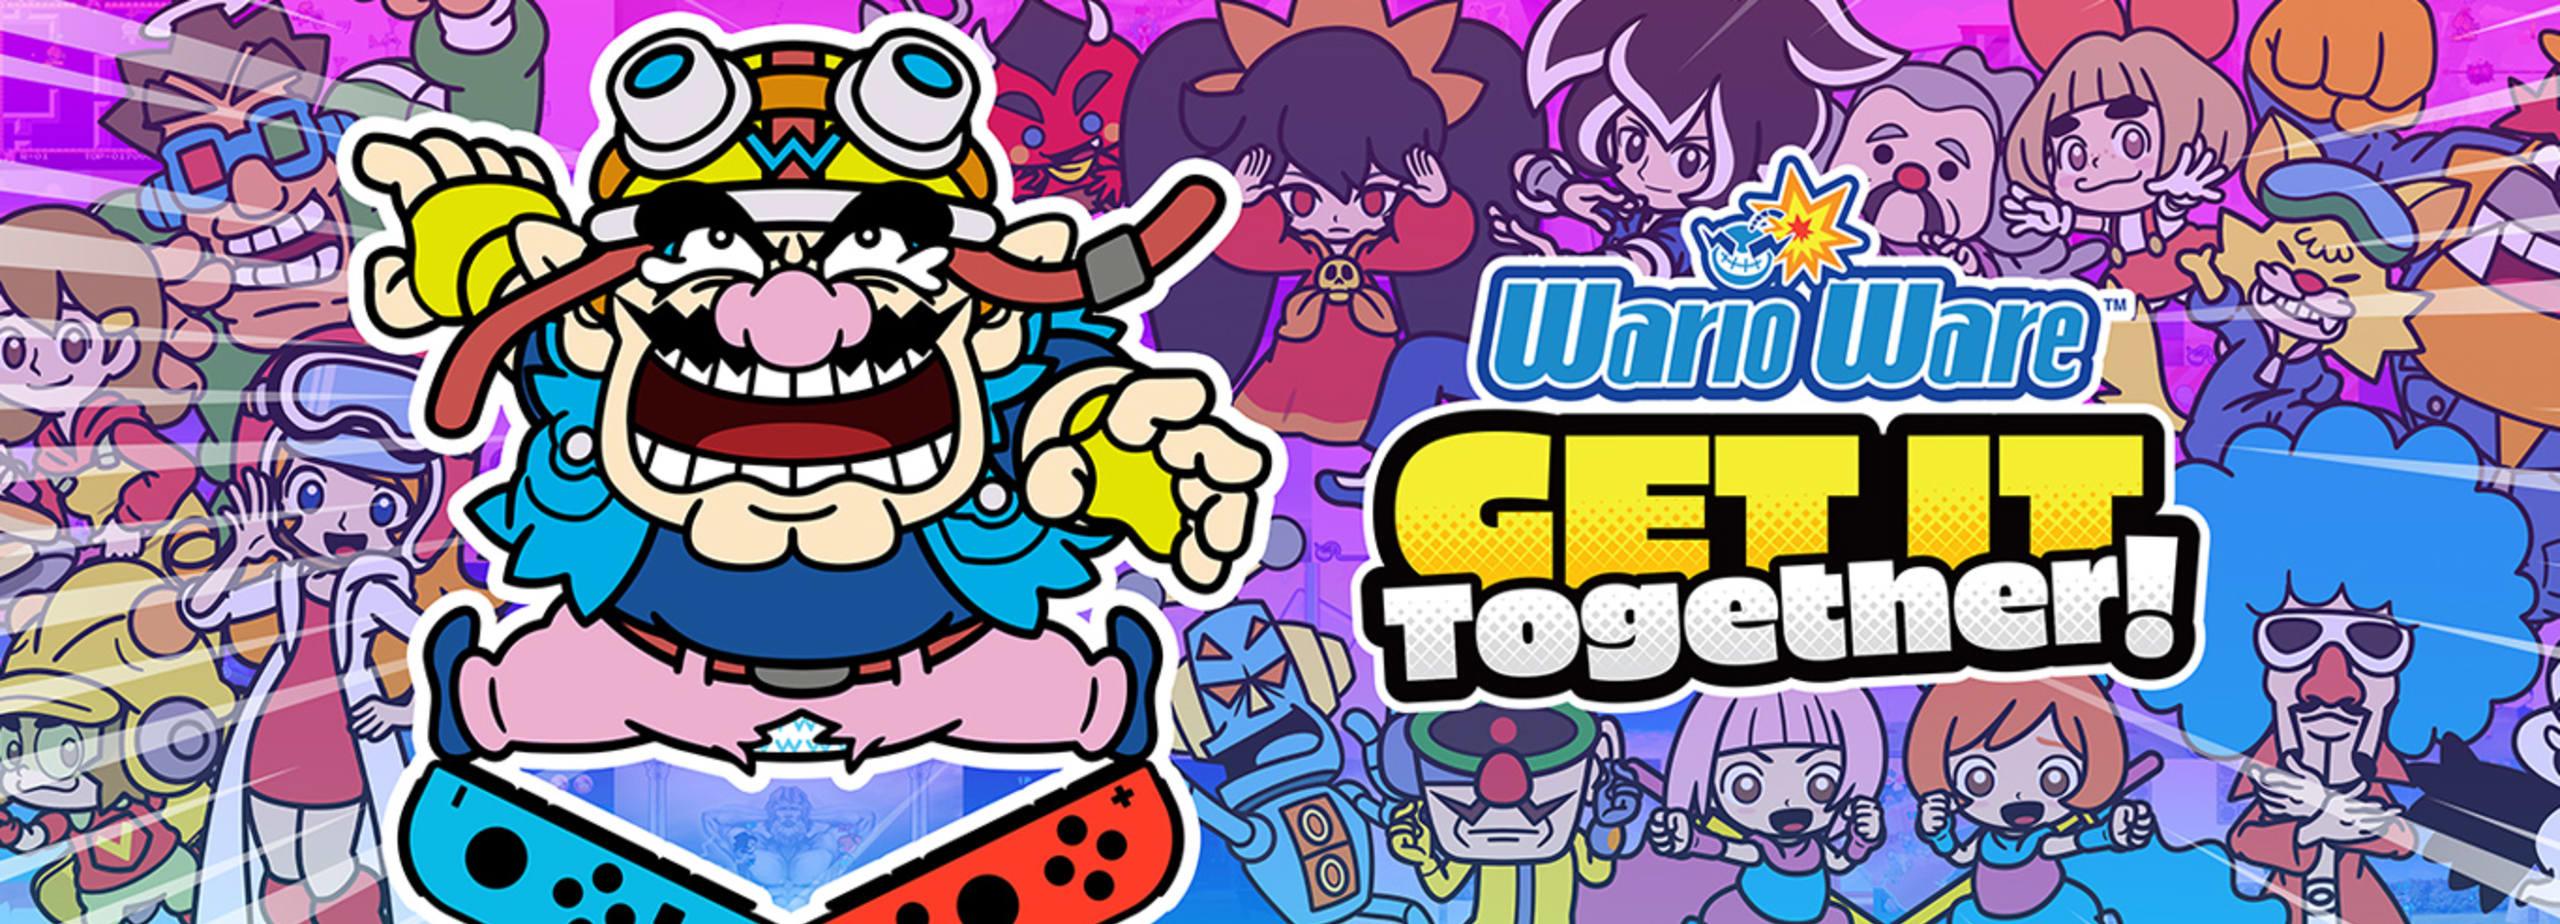 WarioWare: Get it Together! - Disponible maintenant